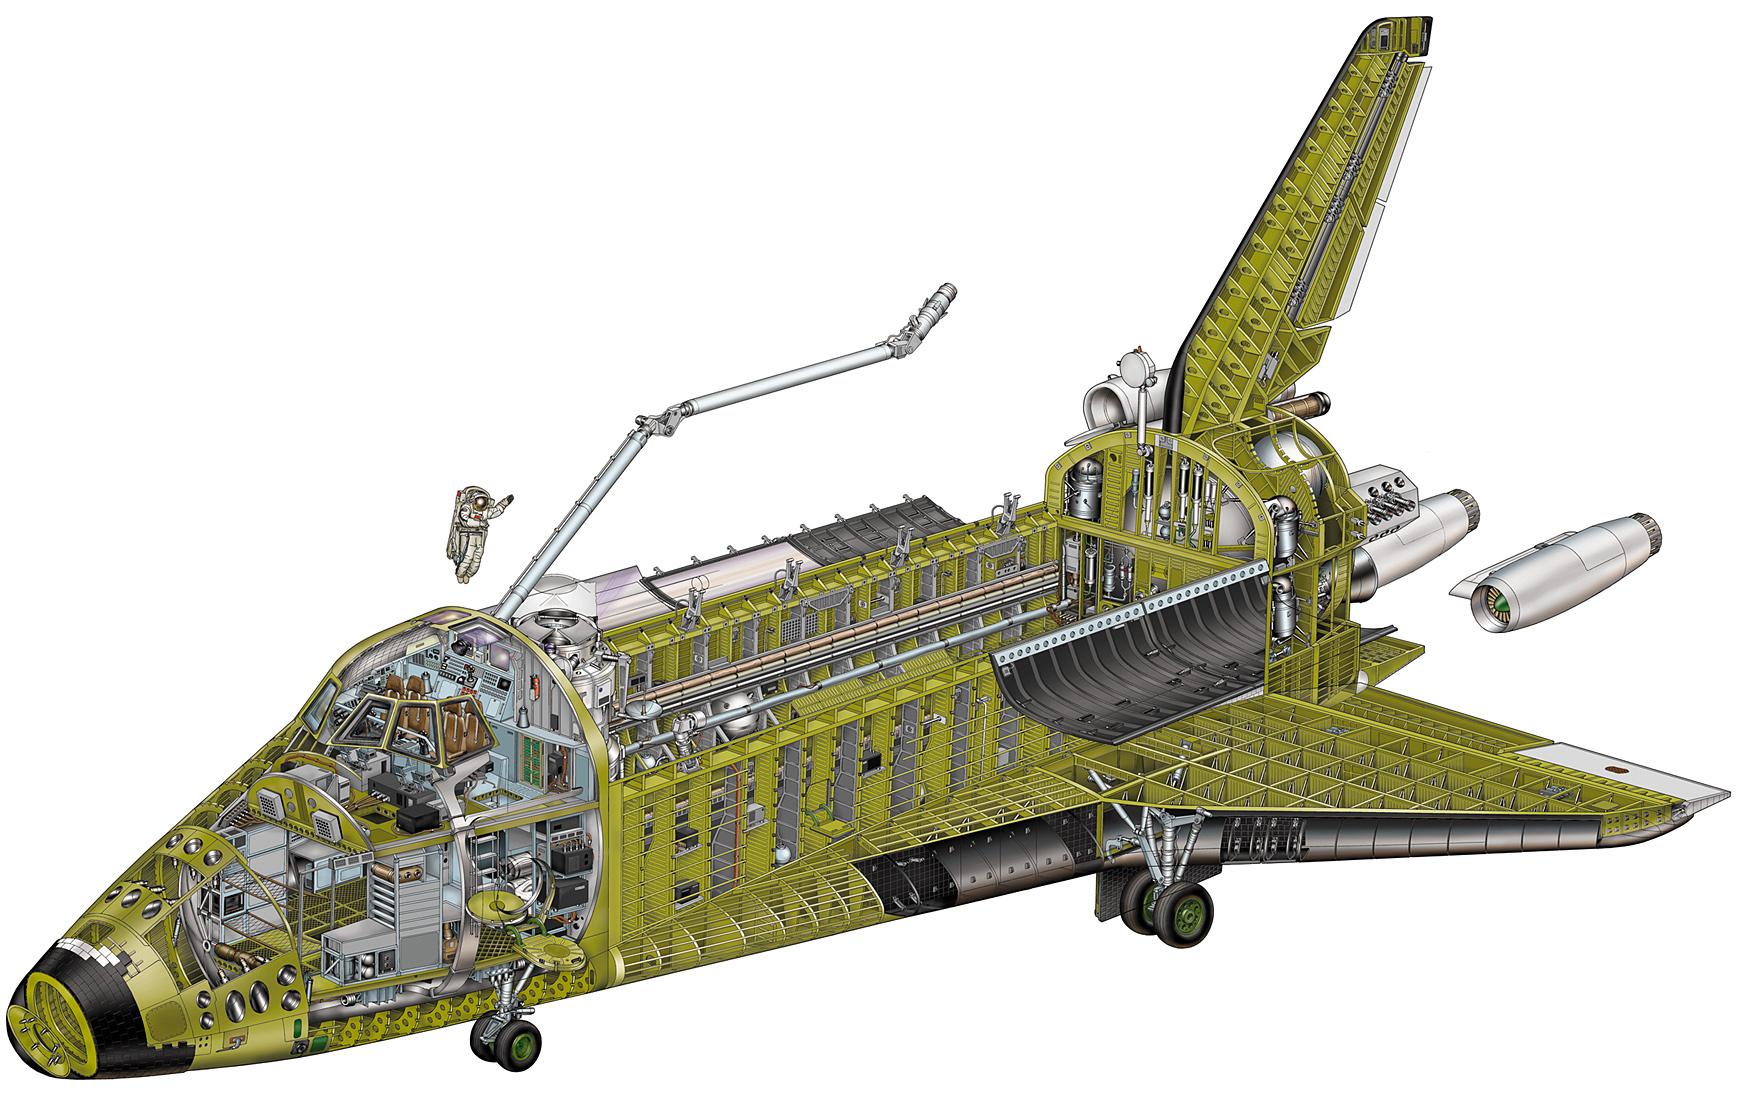 buran 6 Buran Raumfahrtprogram